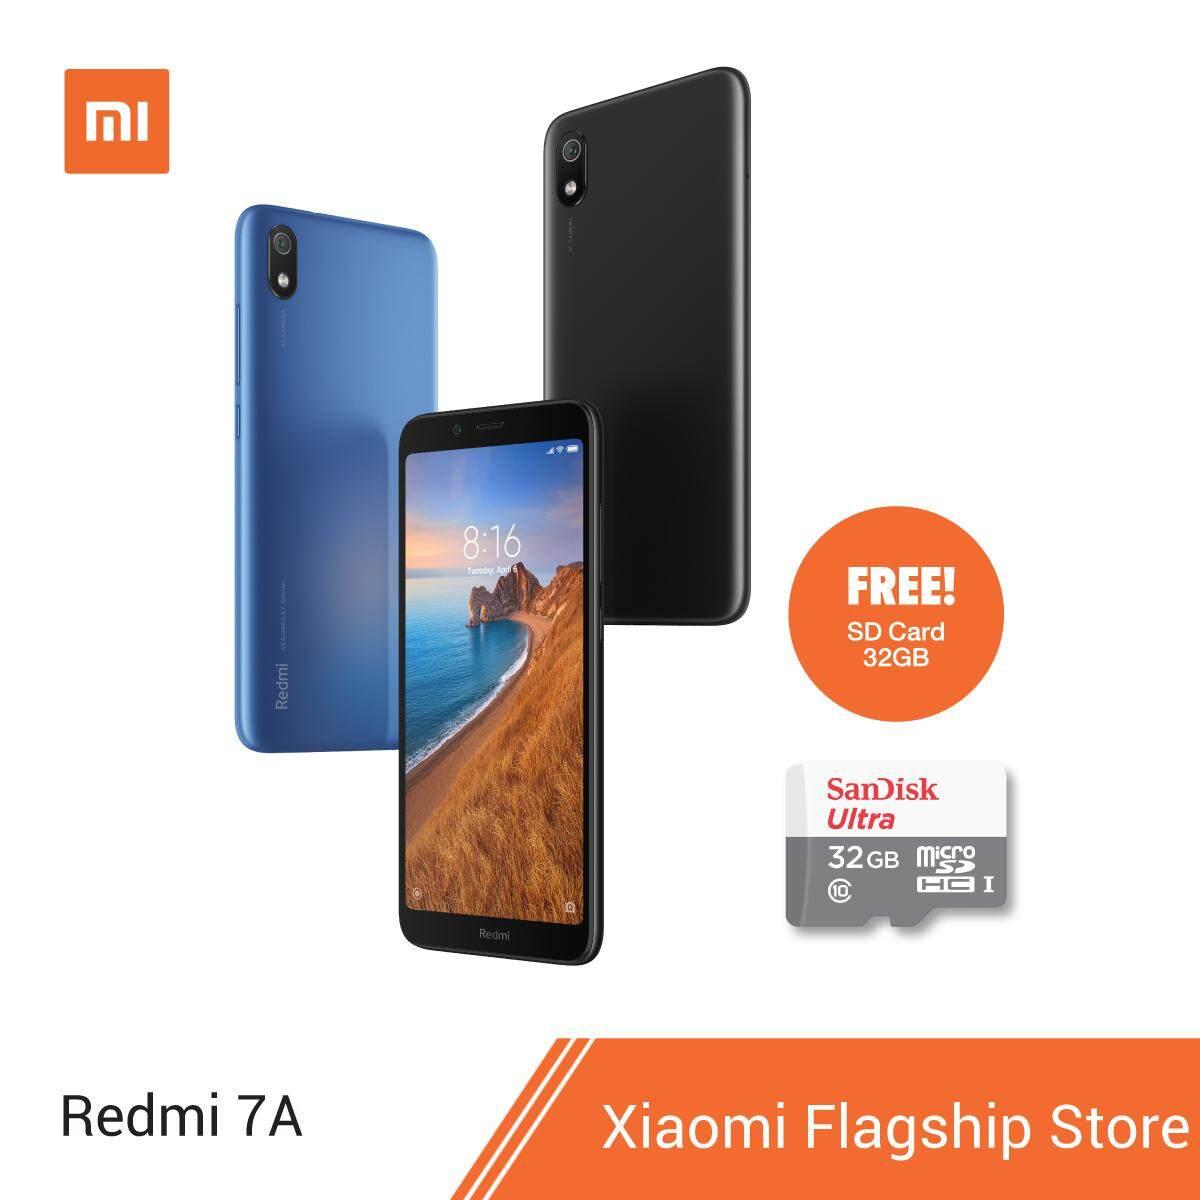 [Pre Order] Xiaomi Redmi 7A (2/16GB) ฟรี! Micro SD Card 32GB เริ่มส่งของวันที่ 11 ก.ค. เป็นต้นไป  - 09318cdf88c00f8f86cd01c6dd4b73d7 - เอาไปรวย !! เลขเด็ดรวยทรัพย์ งวดวันที่ 15 กรกฎาคม 2562 ขอให้โชคดี-เลขเด็ด งวดนี้